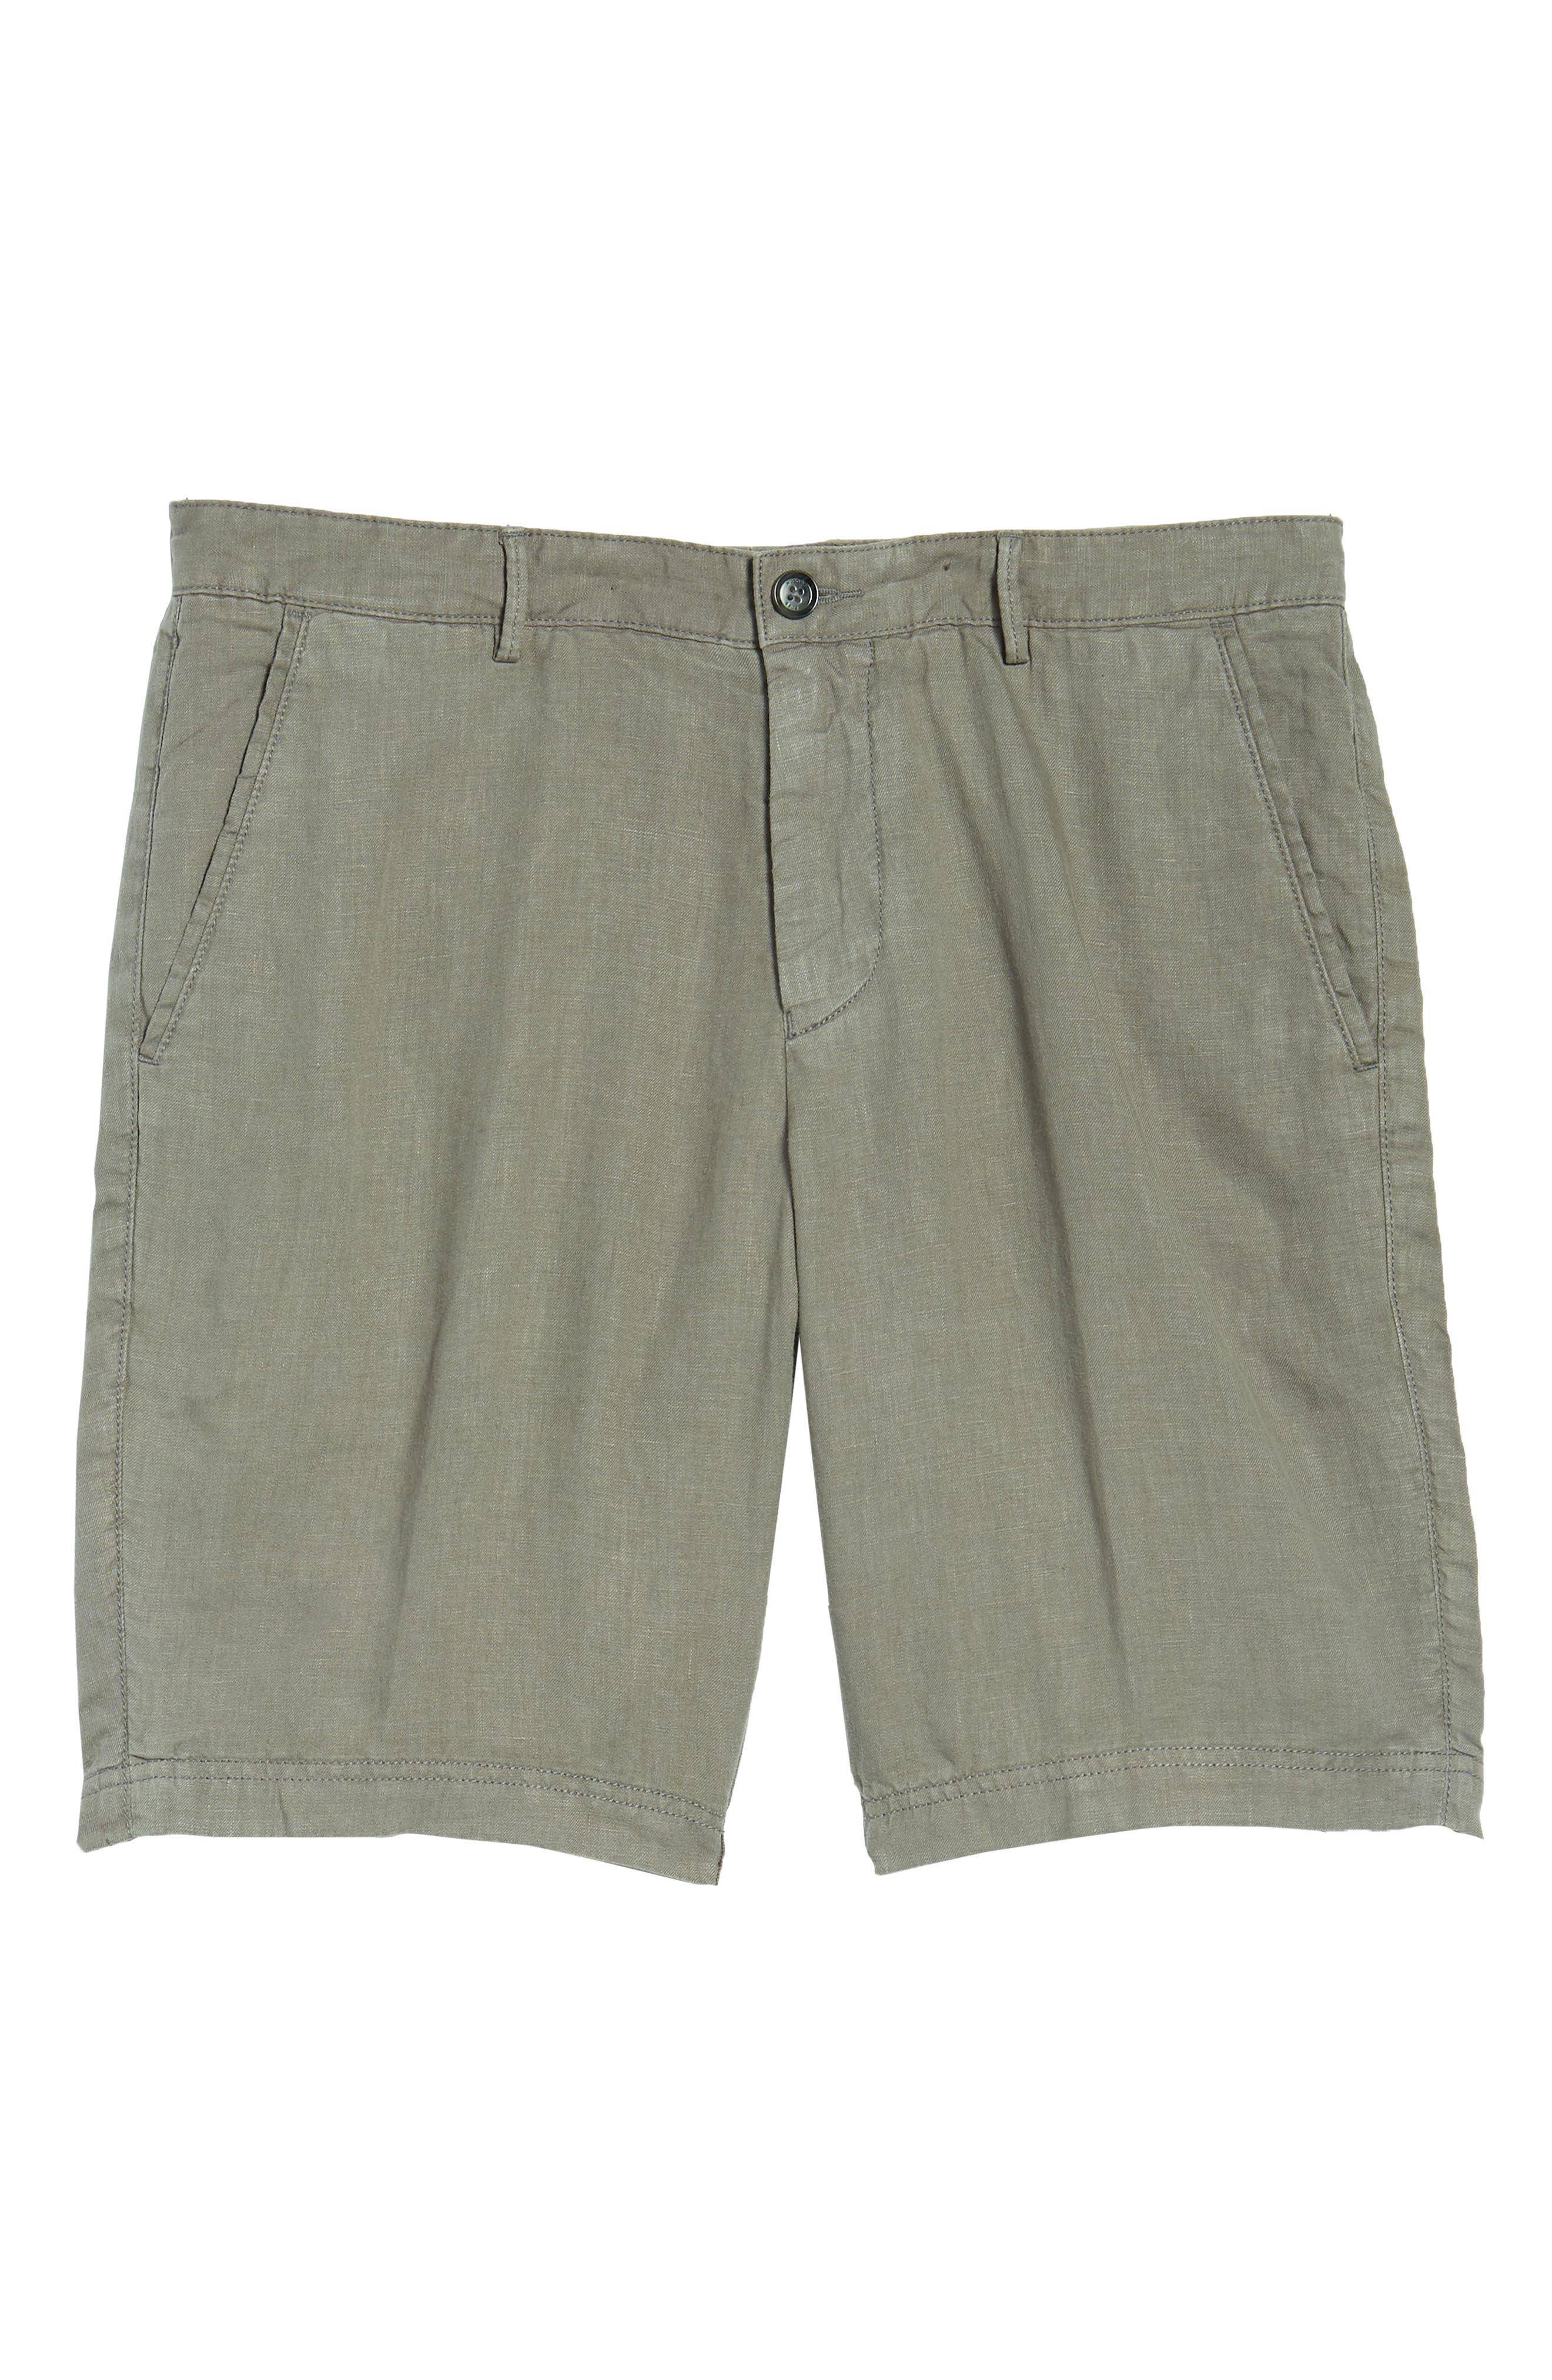 Crigan Linen Shorts,                             Alternate thumbnail 27, color,